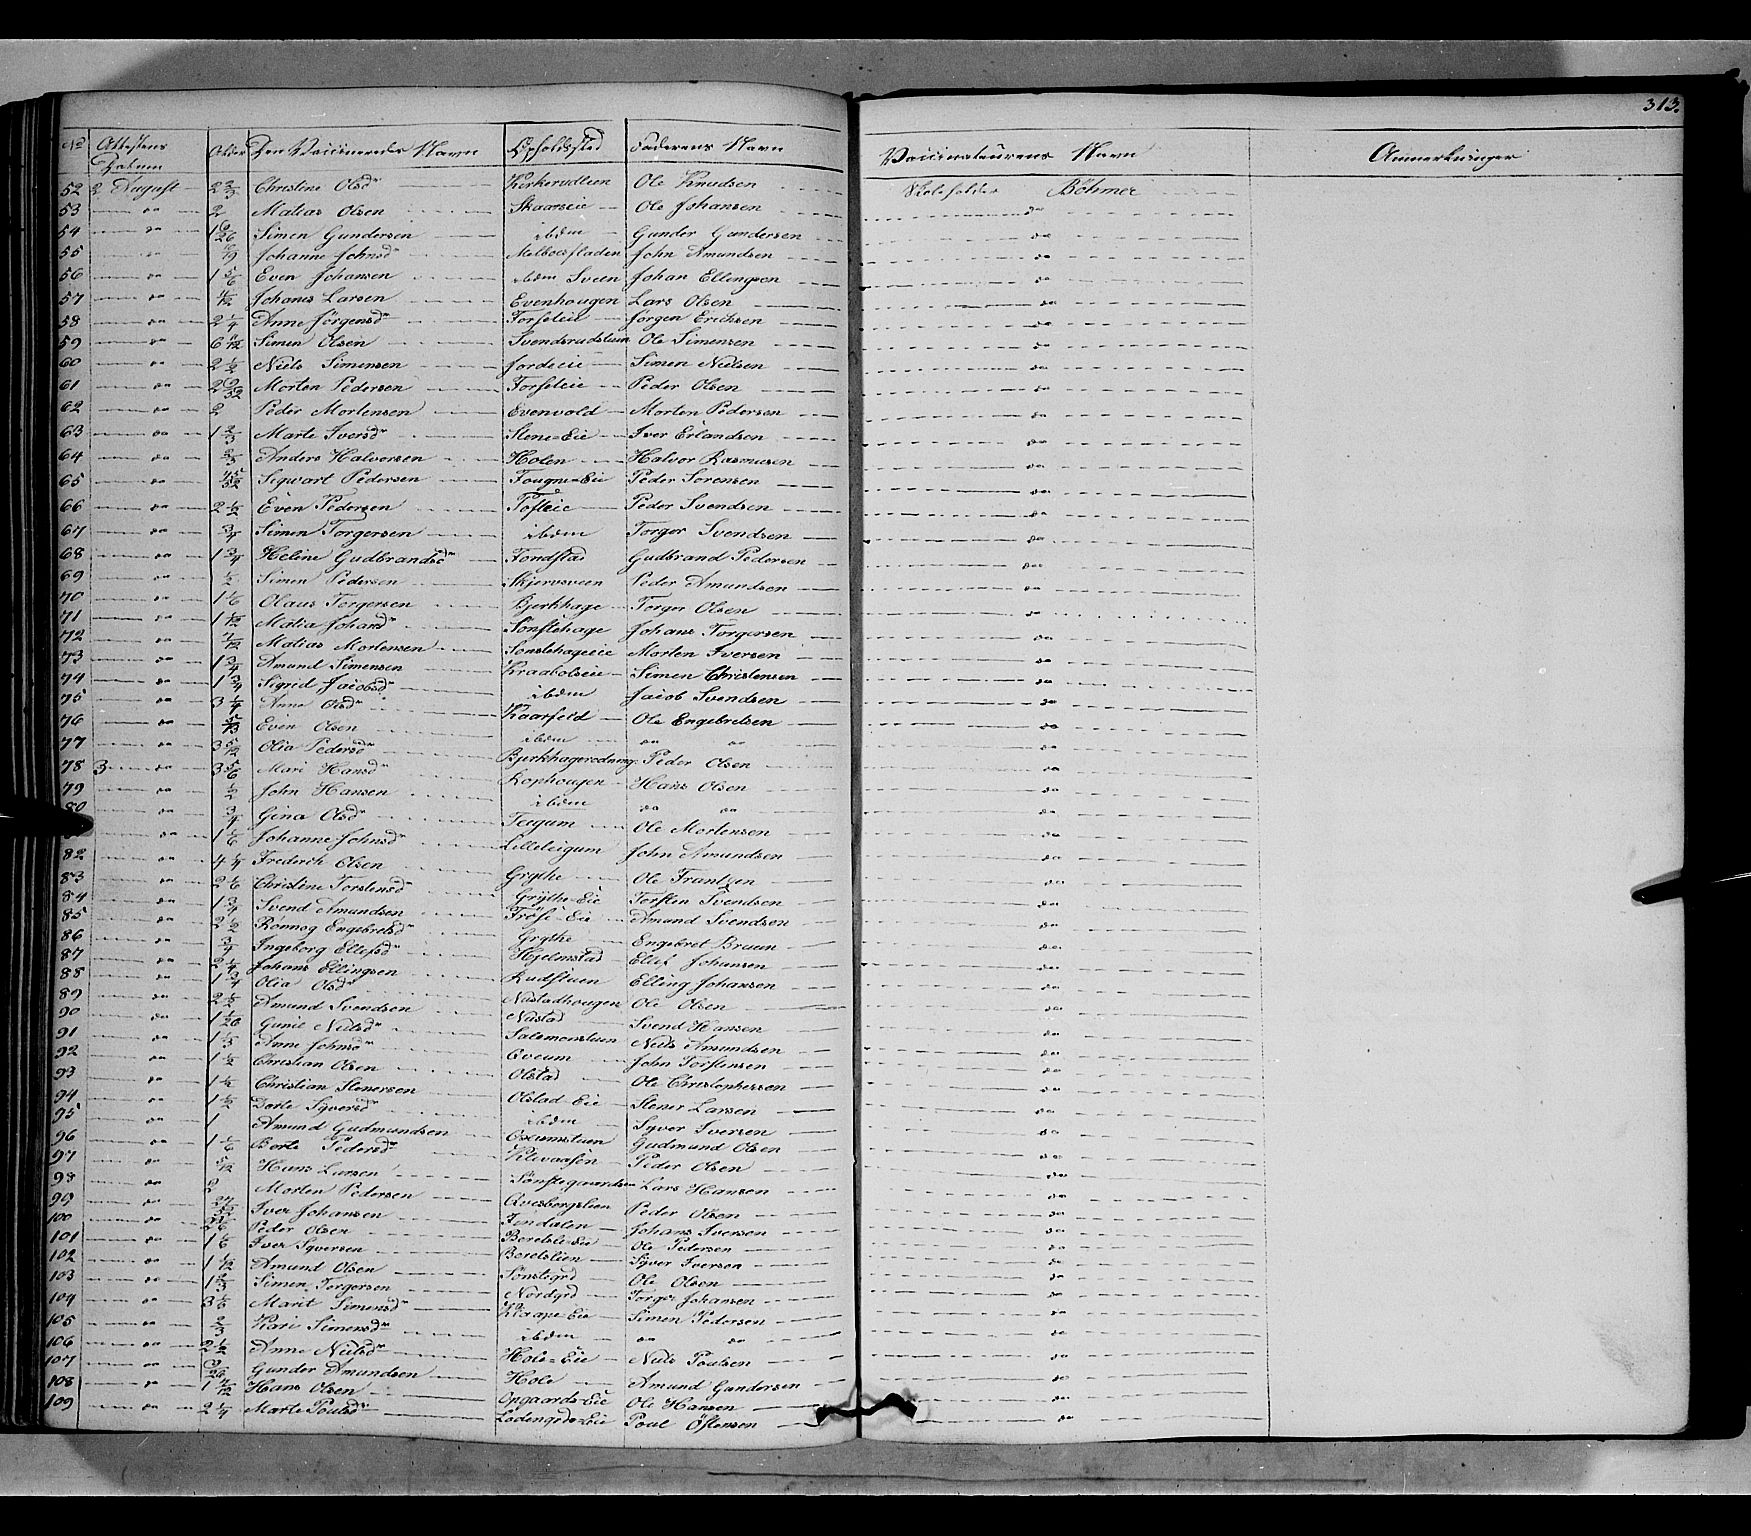 SAH, Gausdal prestekontor, Ministerialbok nr. 7, 1840-1850, s. 313